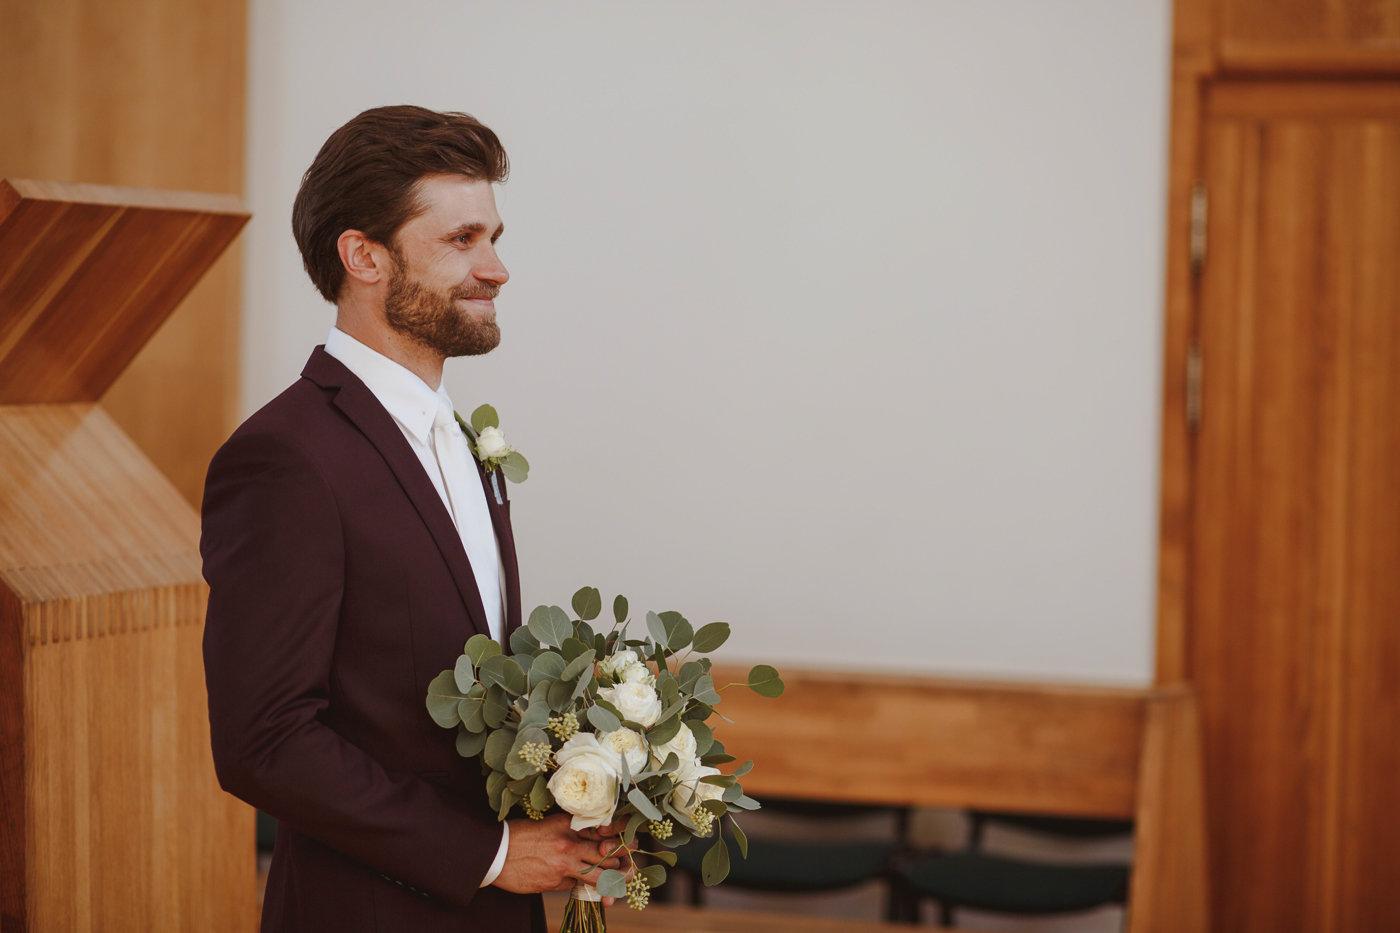 destination-wedding-photography-23.jpg